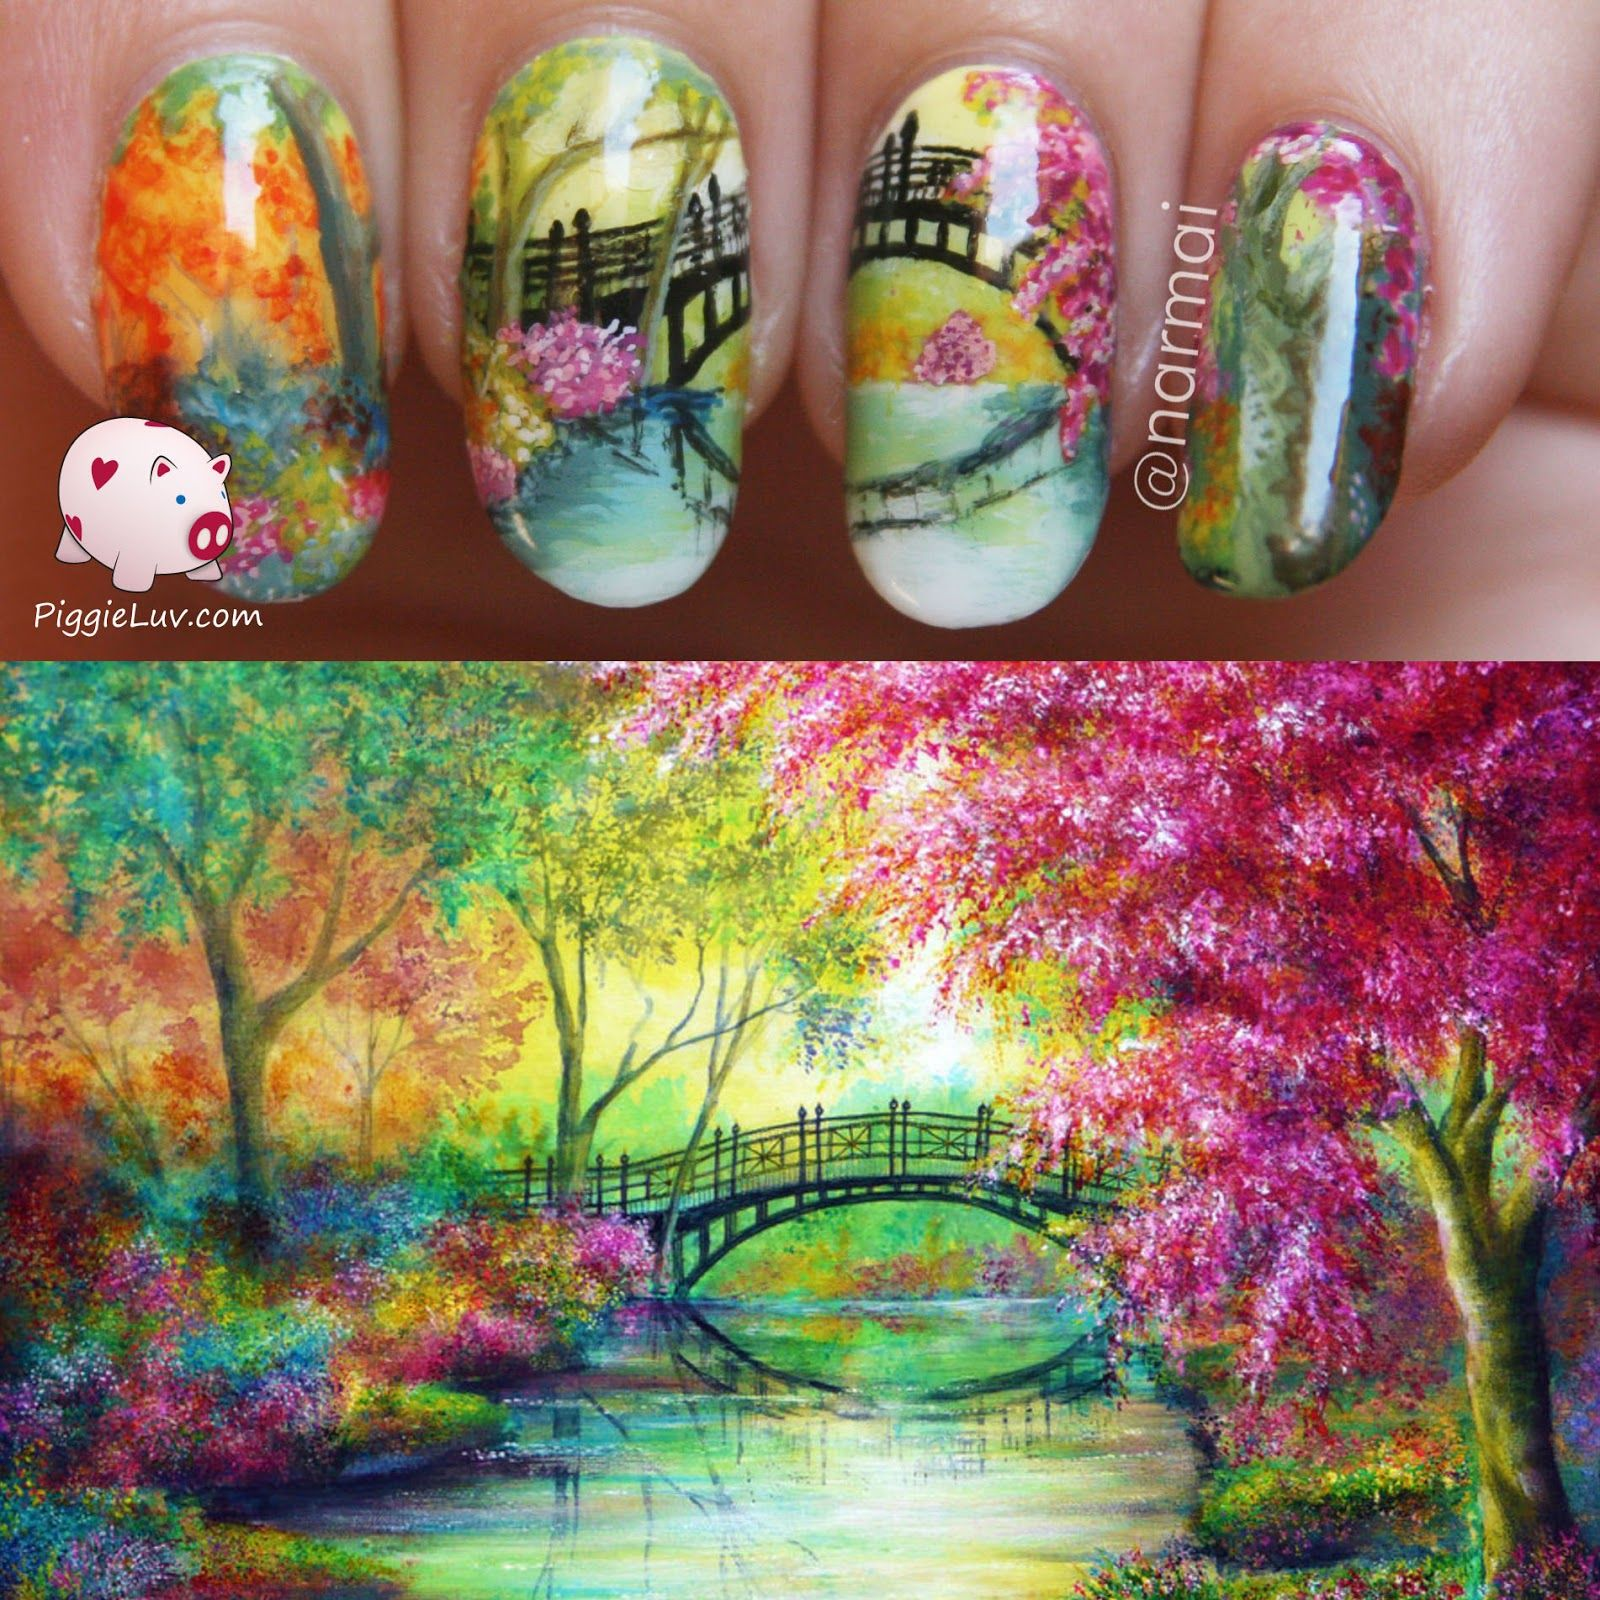 Nail art inspired by Ann Marie Bone | Blog, Arte de uñas y Diseños ...